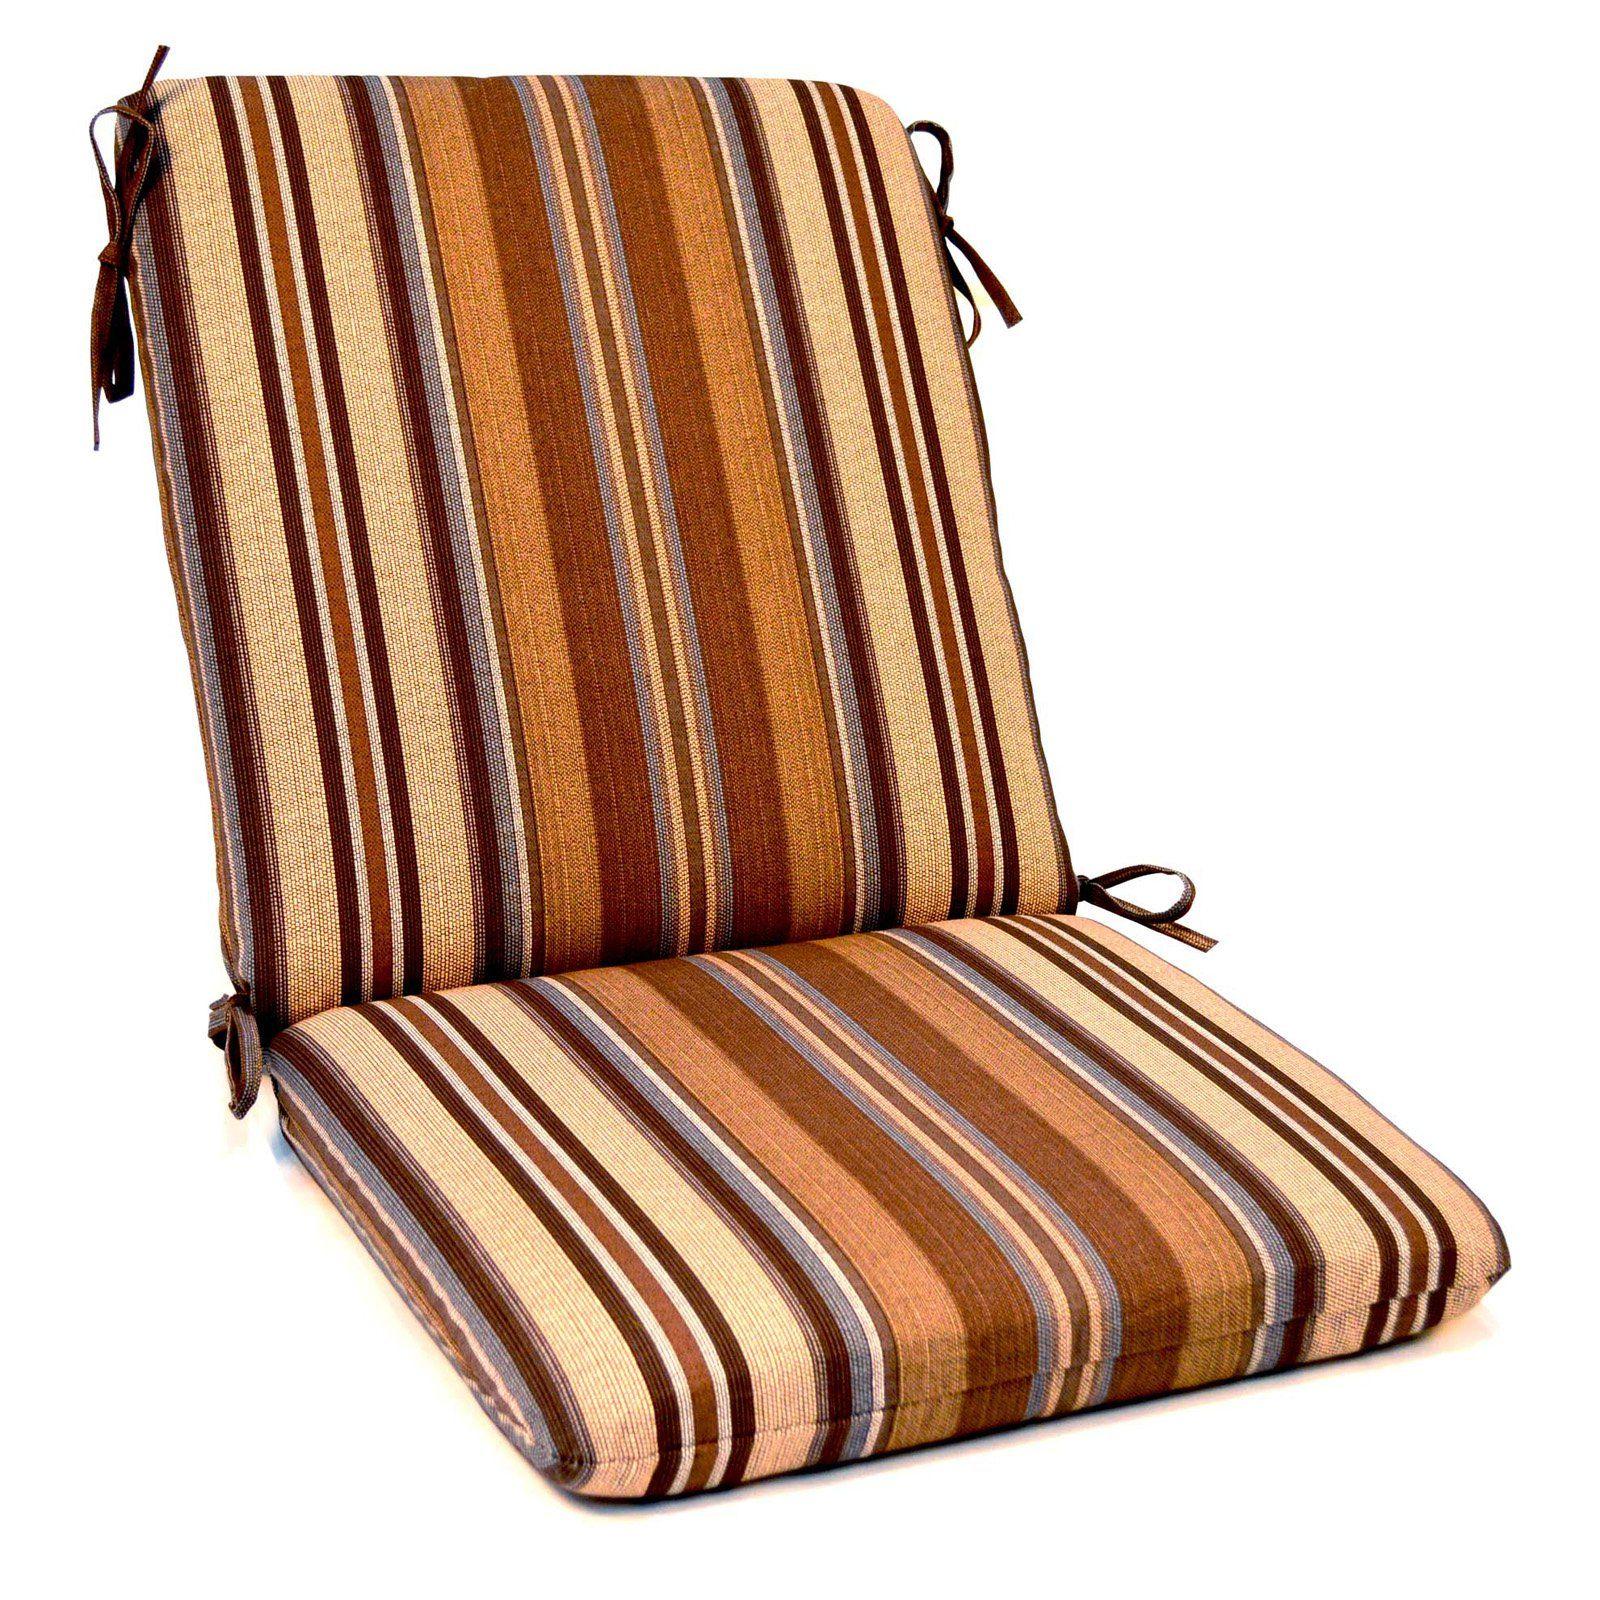 Casual cushion high back outdoor chair cushion set of 2